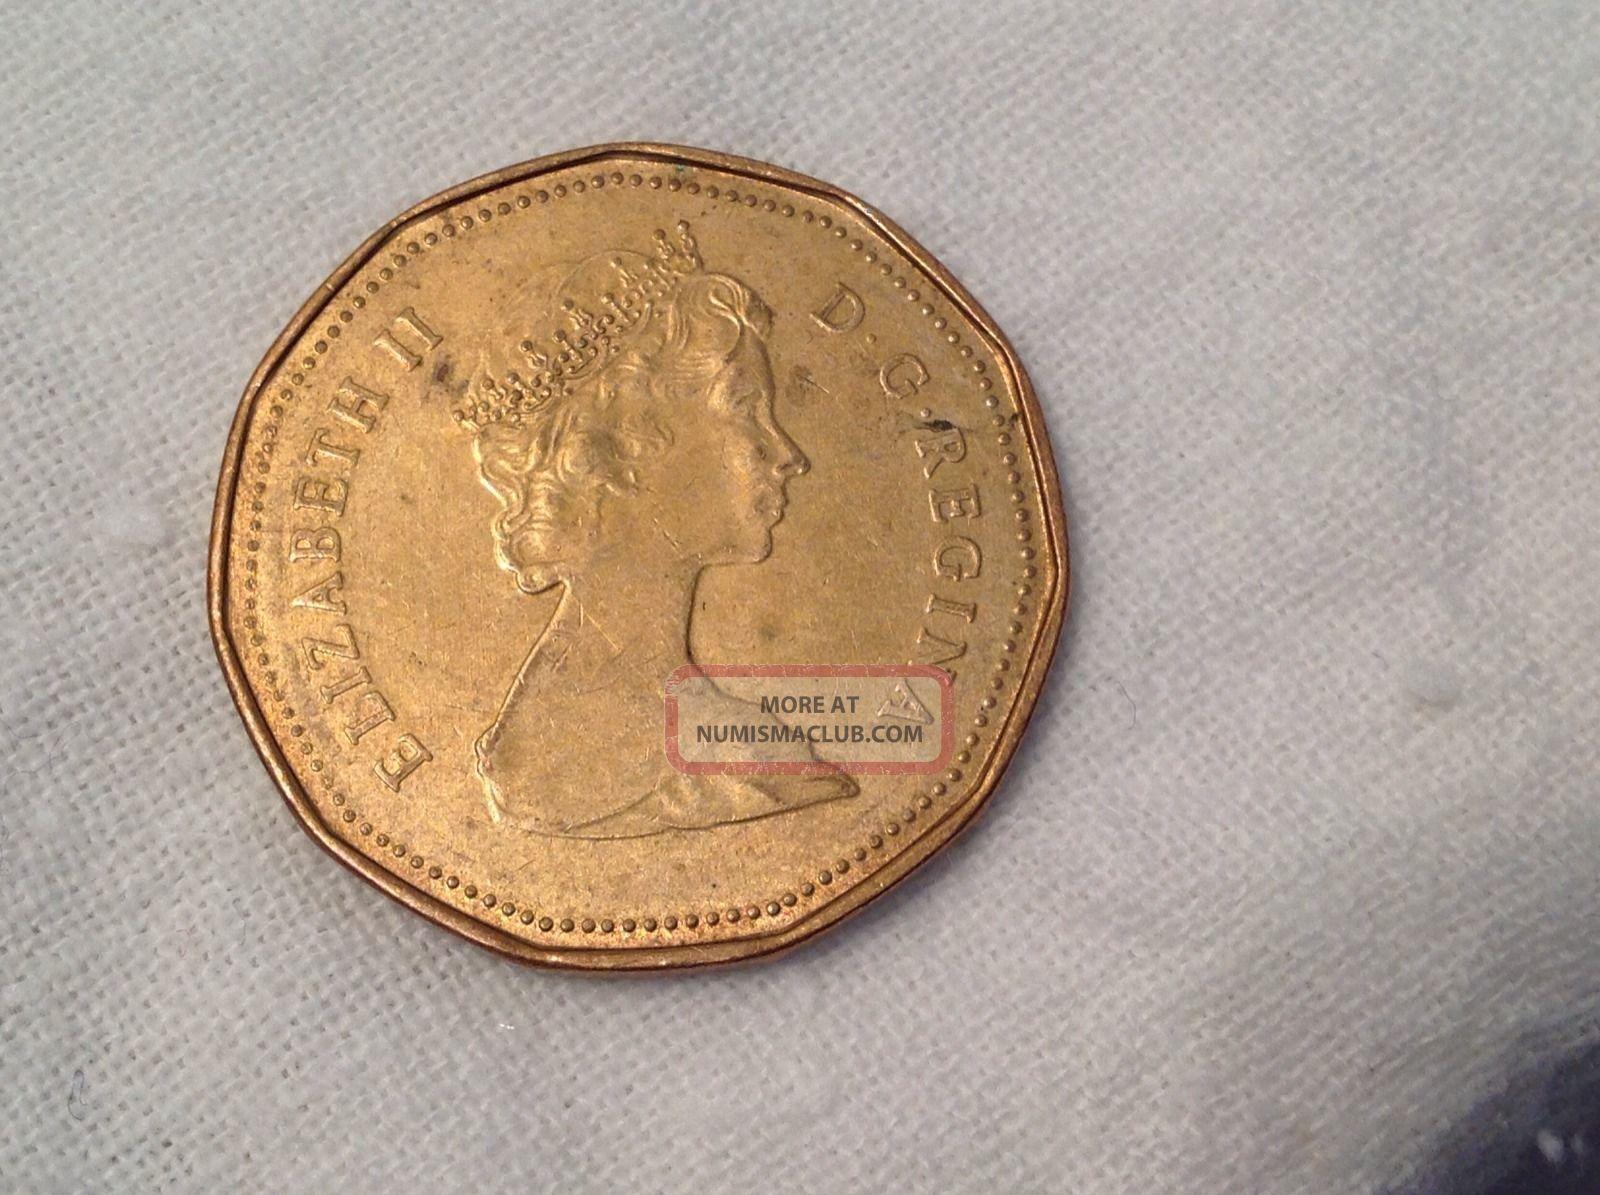 1987 Coin Canada Canadian Loon Loonie Queen Elizabeth Ii One 1 Dollar Money